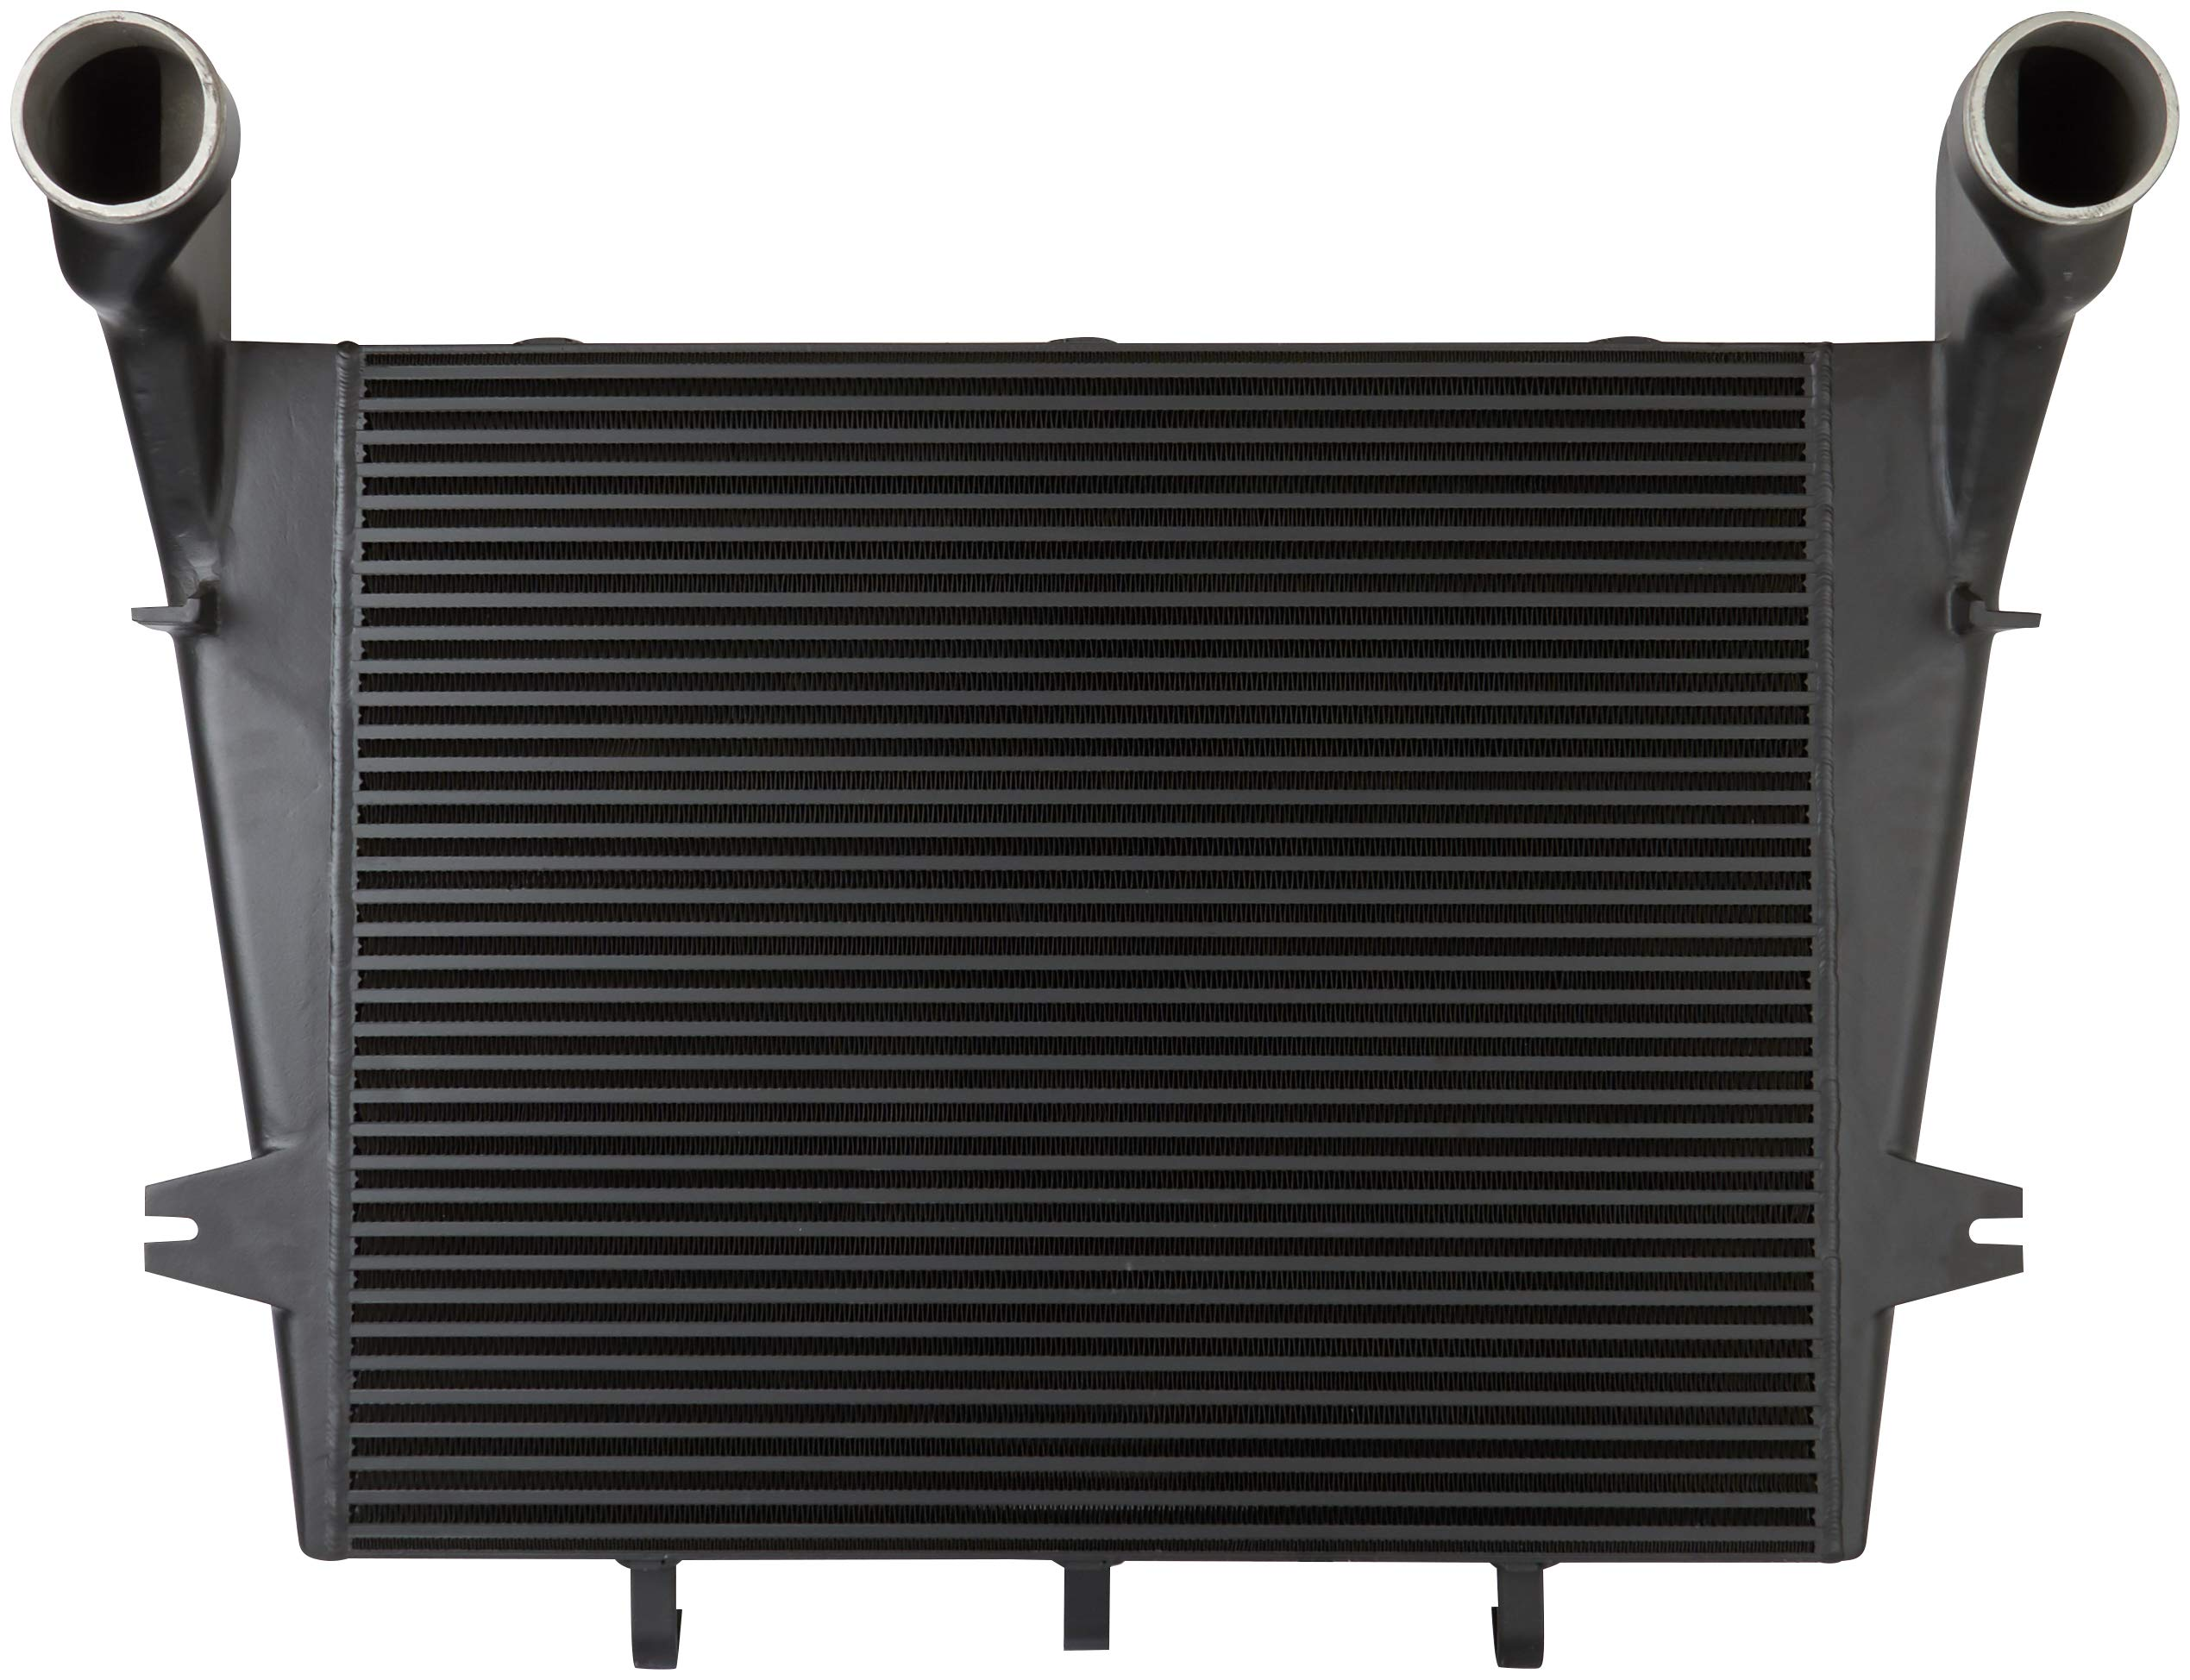 Spectra Premium 4401-3004 Turbocharger Intercooler